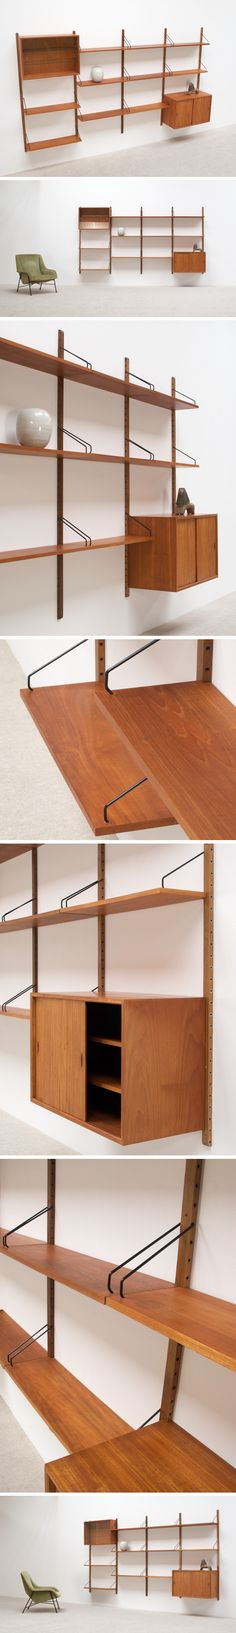 Poul Cadovius modular Wall Unit for Royal System Large Wooden Sliding Doors, Sliding Glass Door, Mcm Furniture, Furniture Design, Wall Unit Designs, Modular Walls, Shelving Systems, Deco Design, Design Design